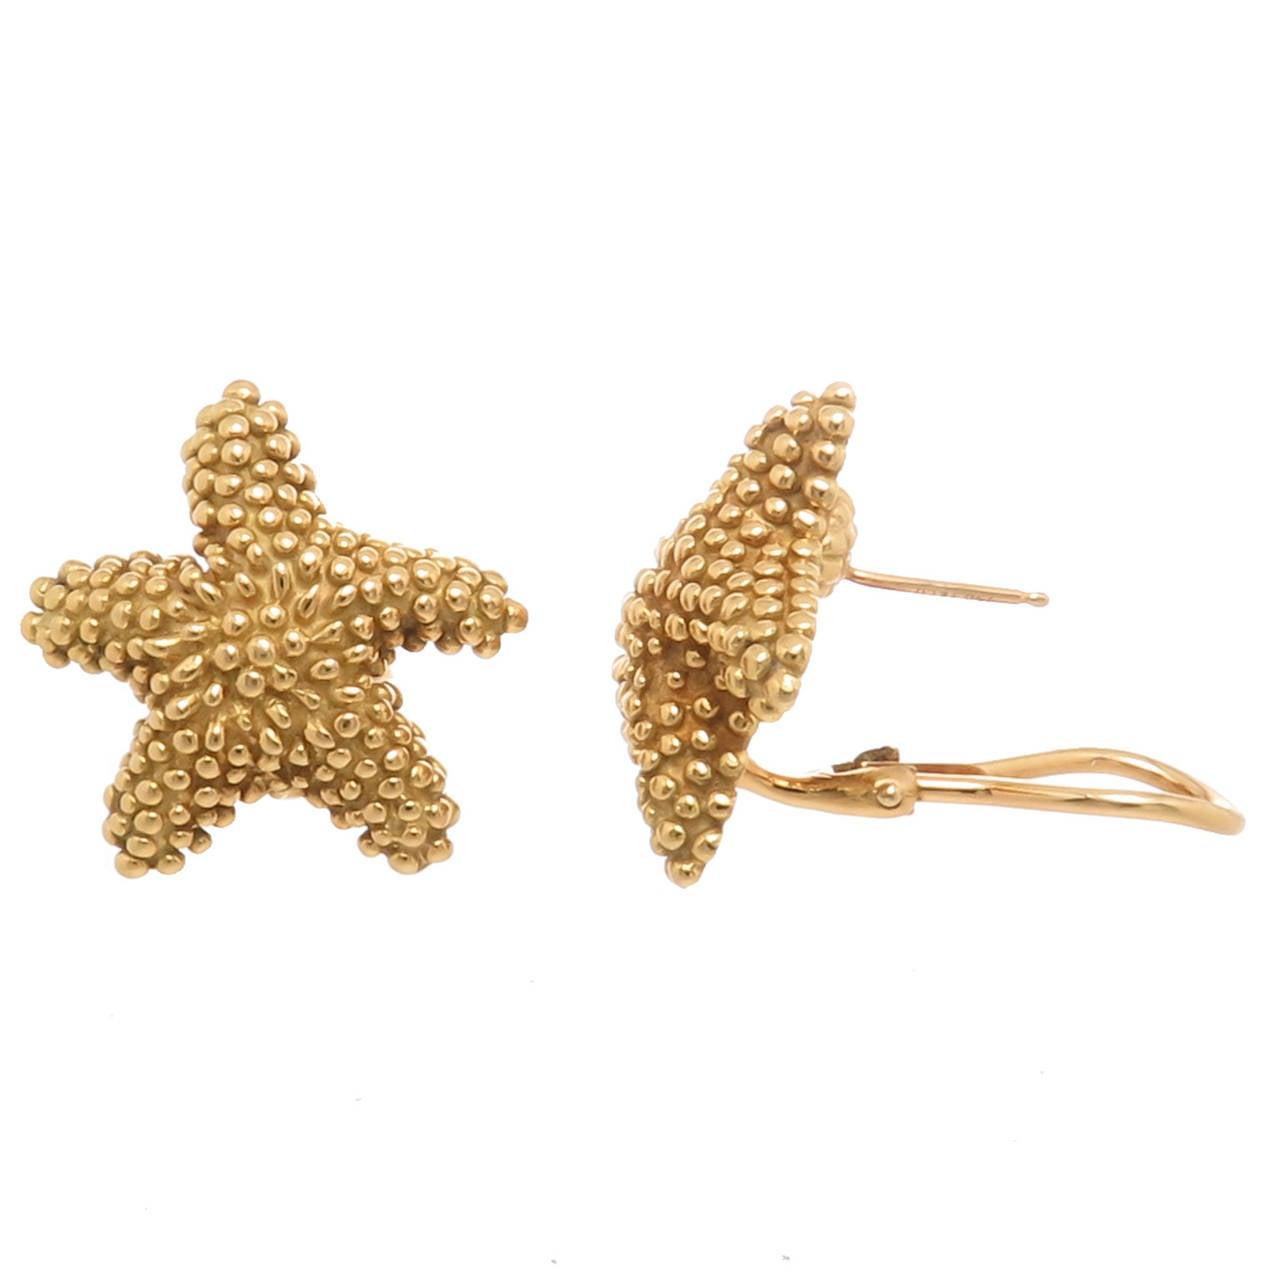 Tiffany & Co. Yellow Gold Starfish Earrings 2